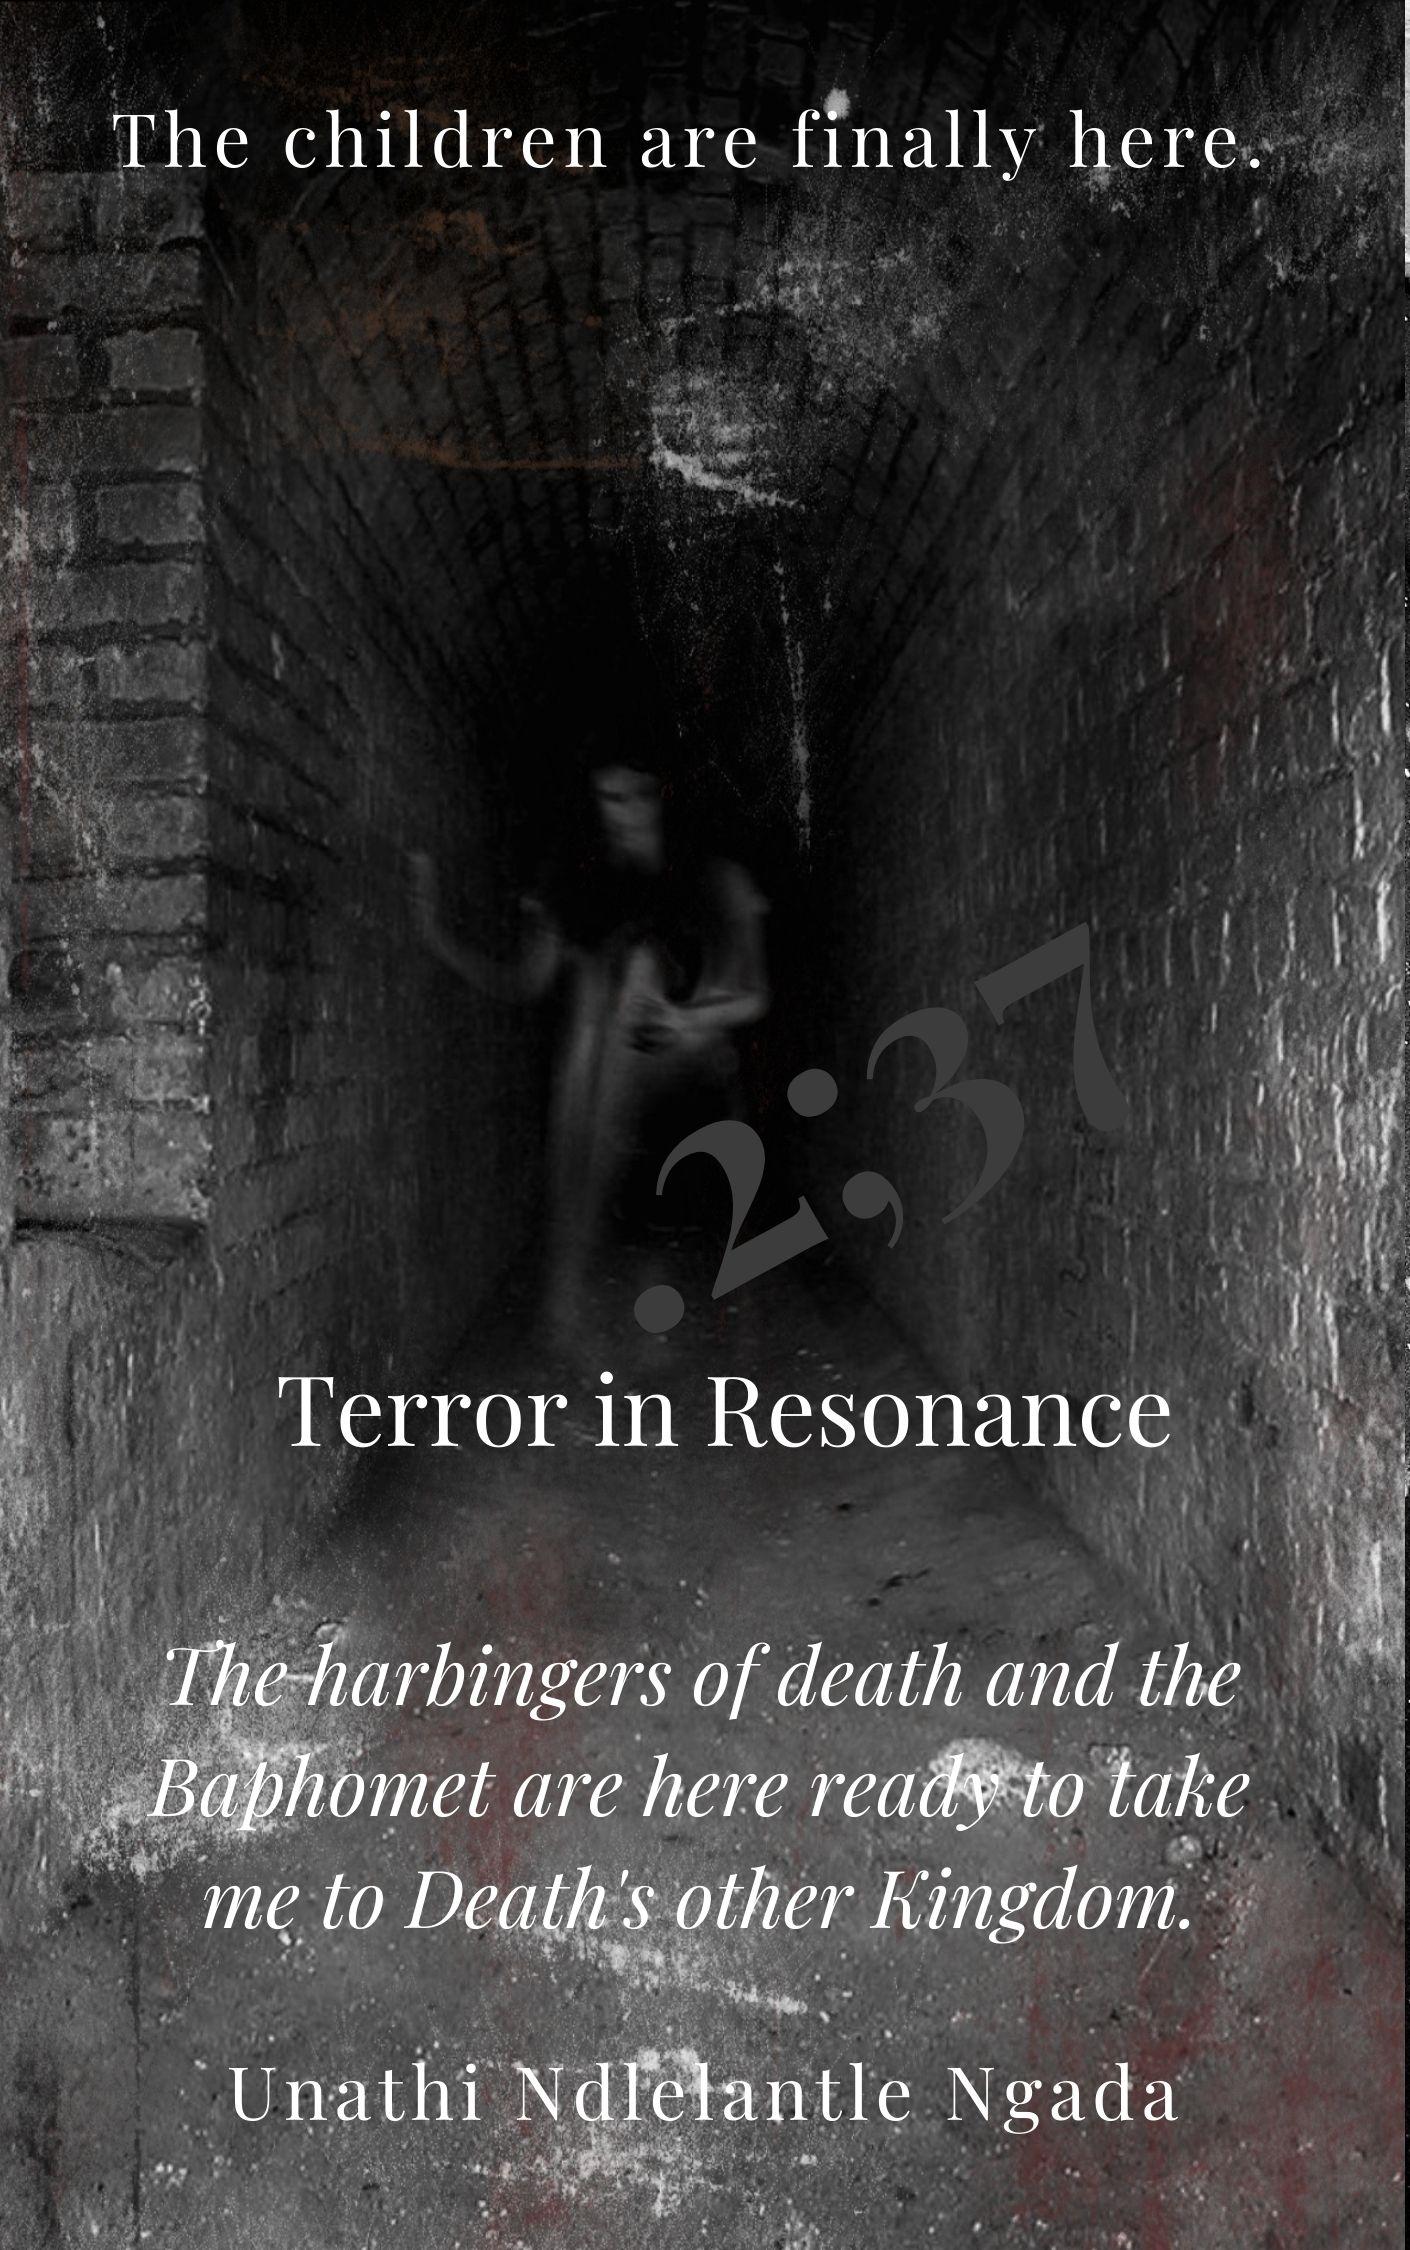 The Author behind '2.37: Terror in Resonance'